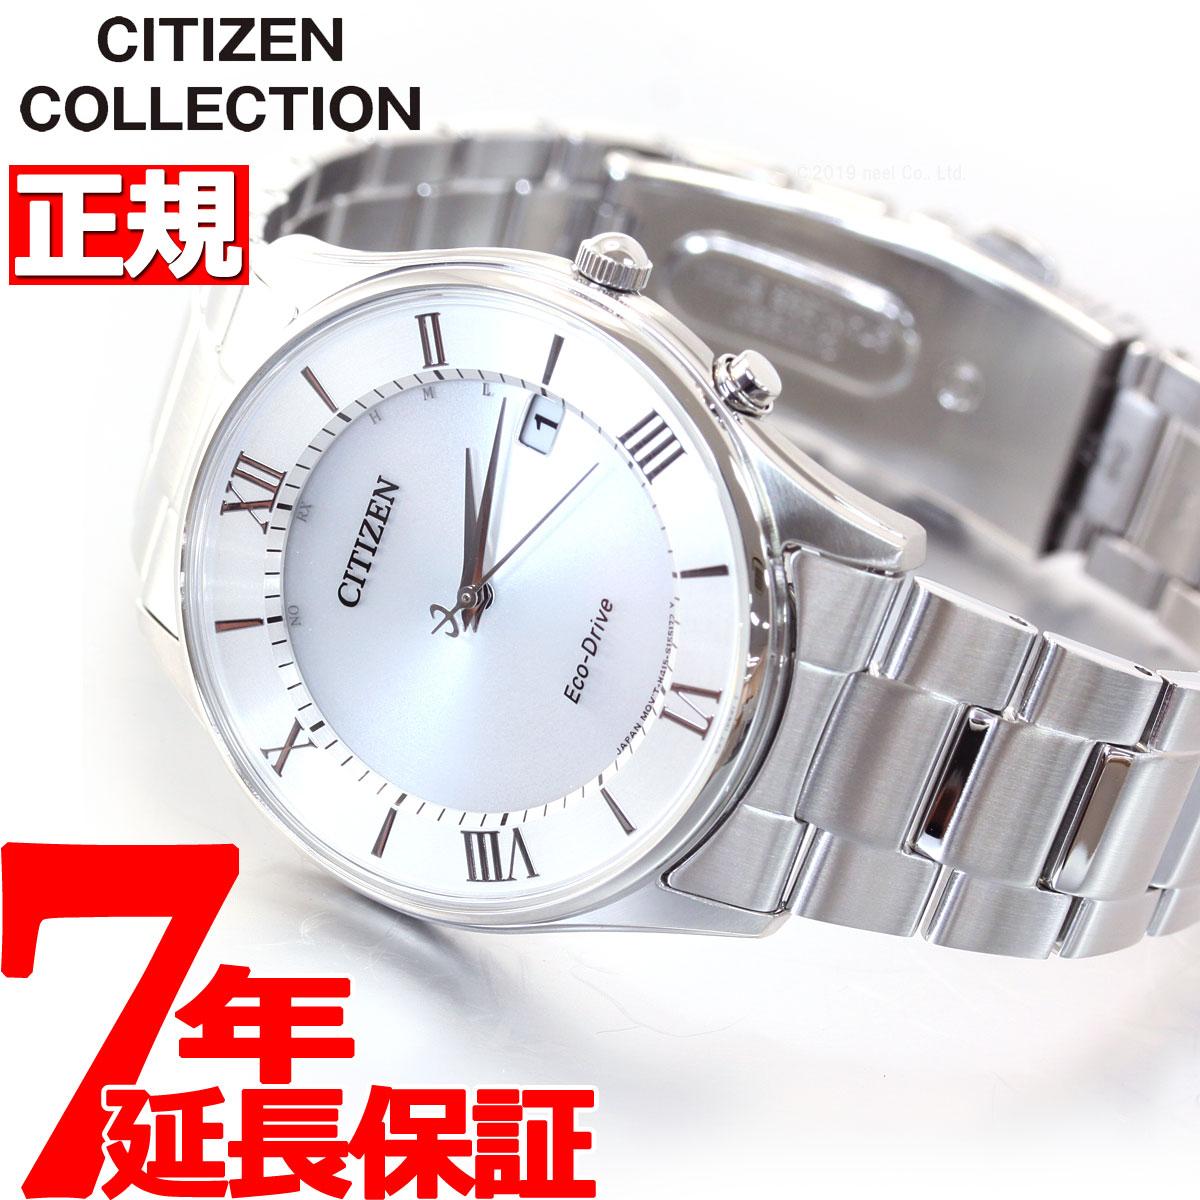 【SHOP OF THE YEAR 2018 受賞】シチズンコレクション CITIZEN COLLECTION エコドライブ ソーラー 電波時計 腕時計 メンズ AS1060-54A